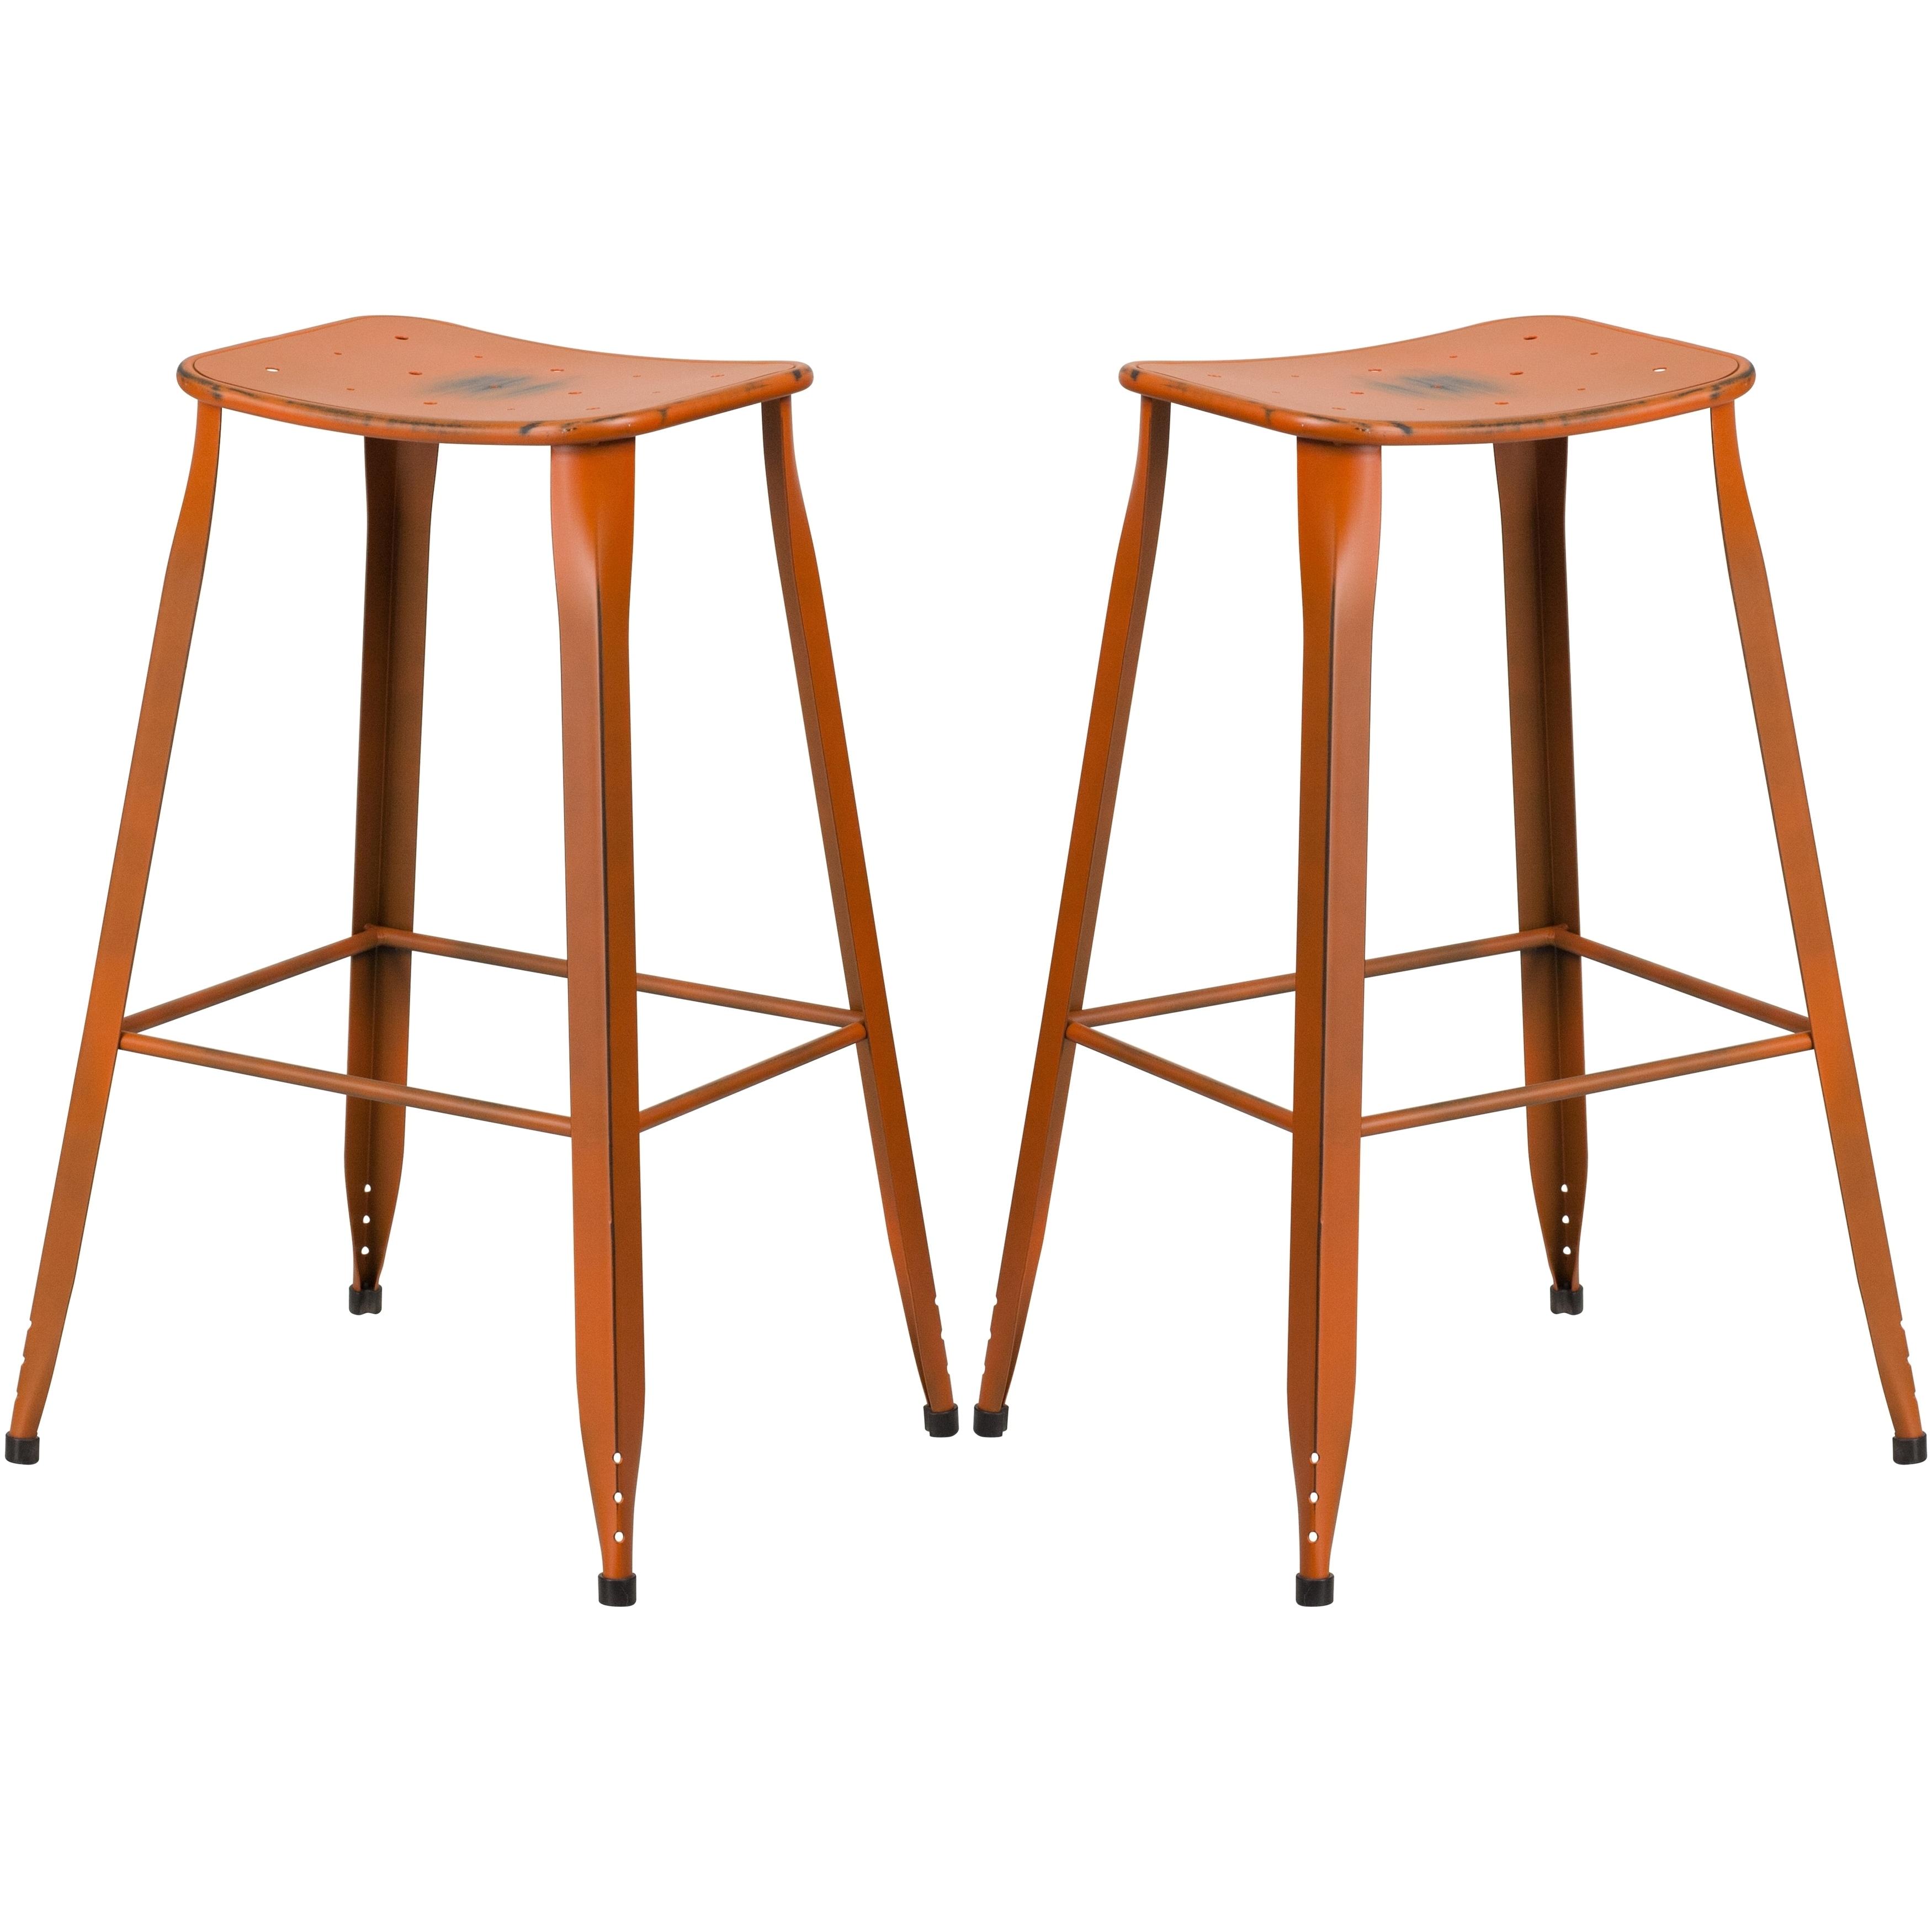 Excellent Distressed Orange Galvanized Metal 30 Inch Bar Stool Dailytribune Chair Design For Home Dailytribuneorg